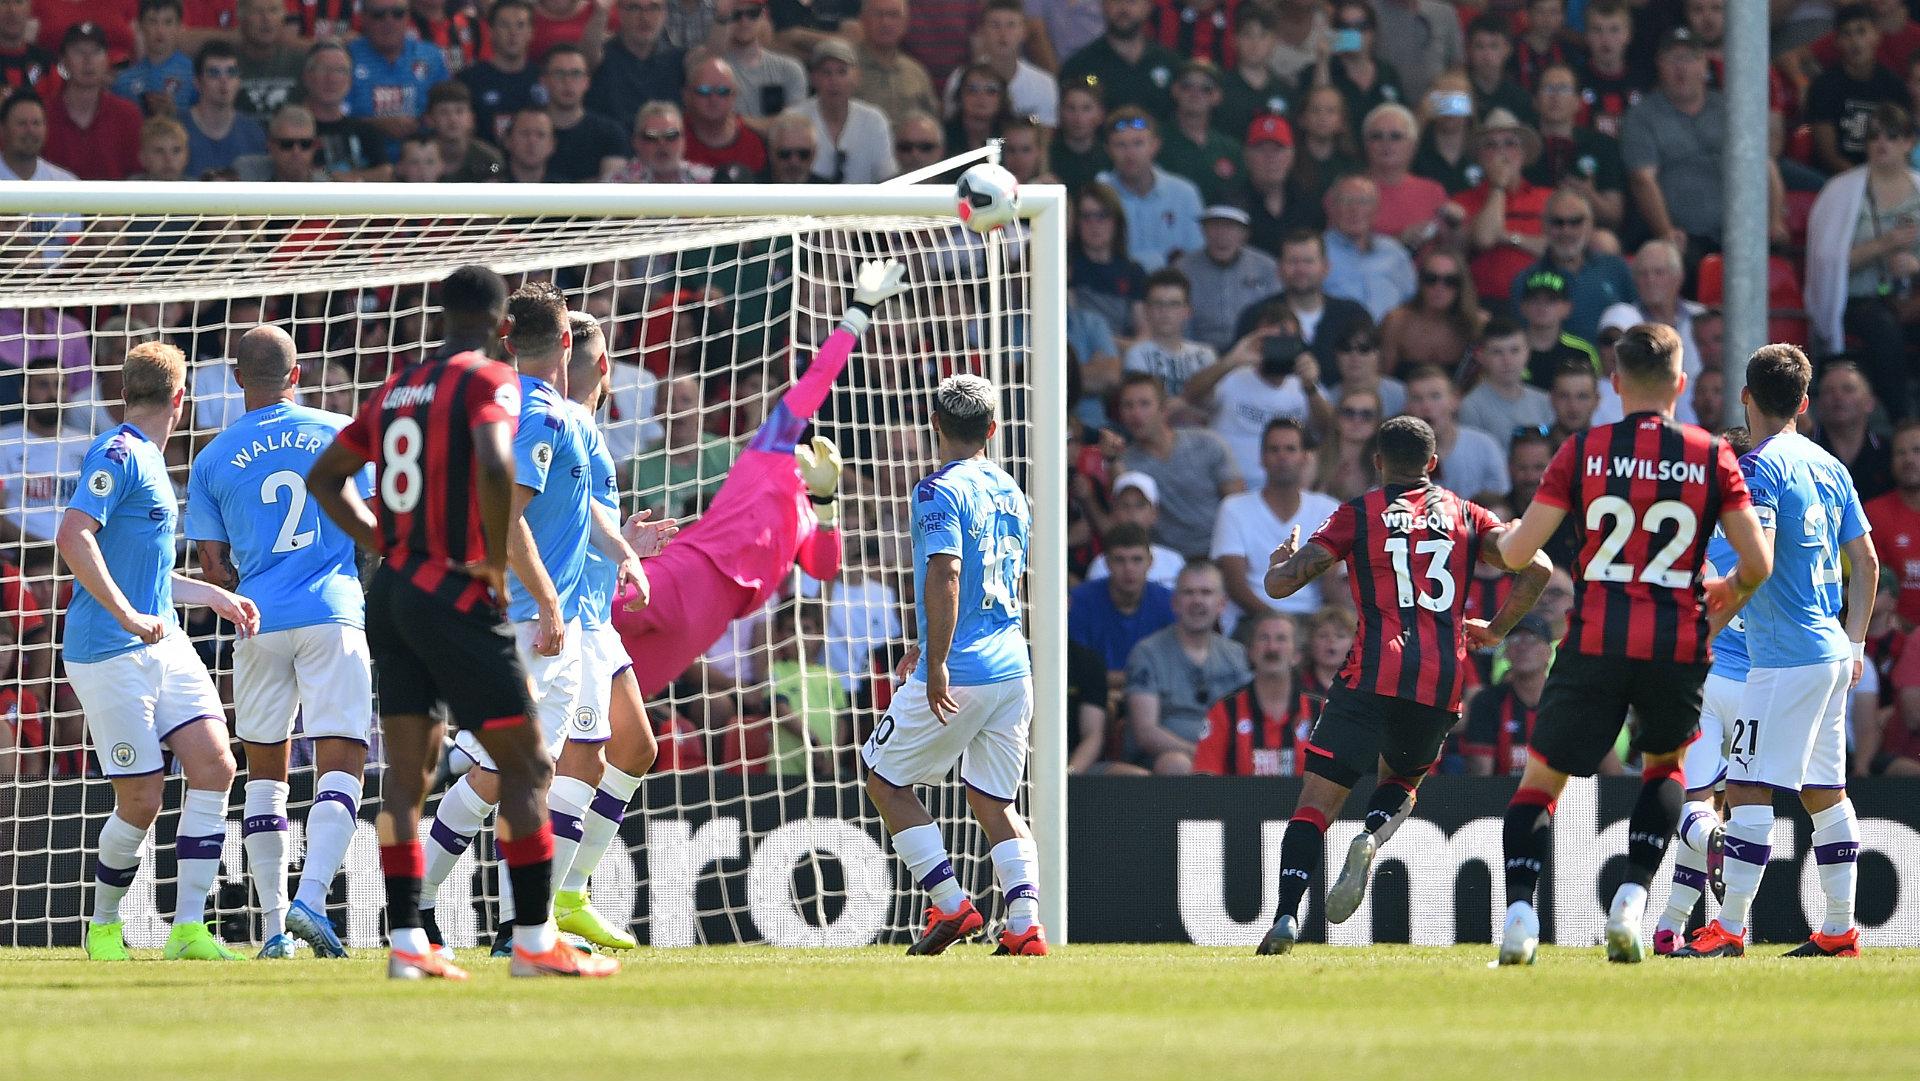 Harry Wilson goal Bournemouth vs Manchester City 2019-20